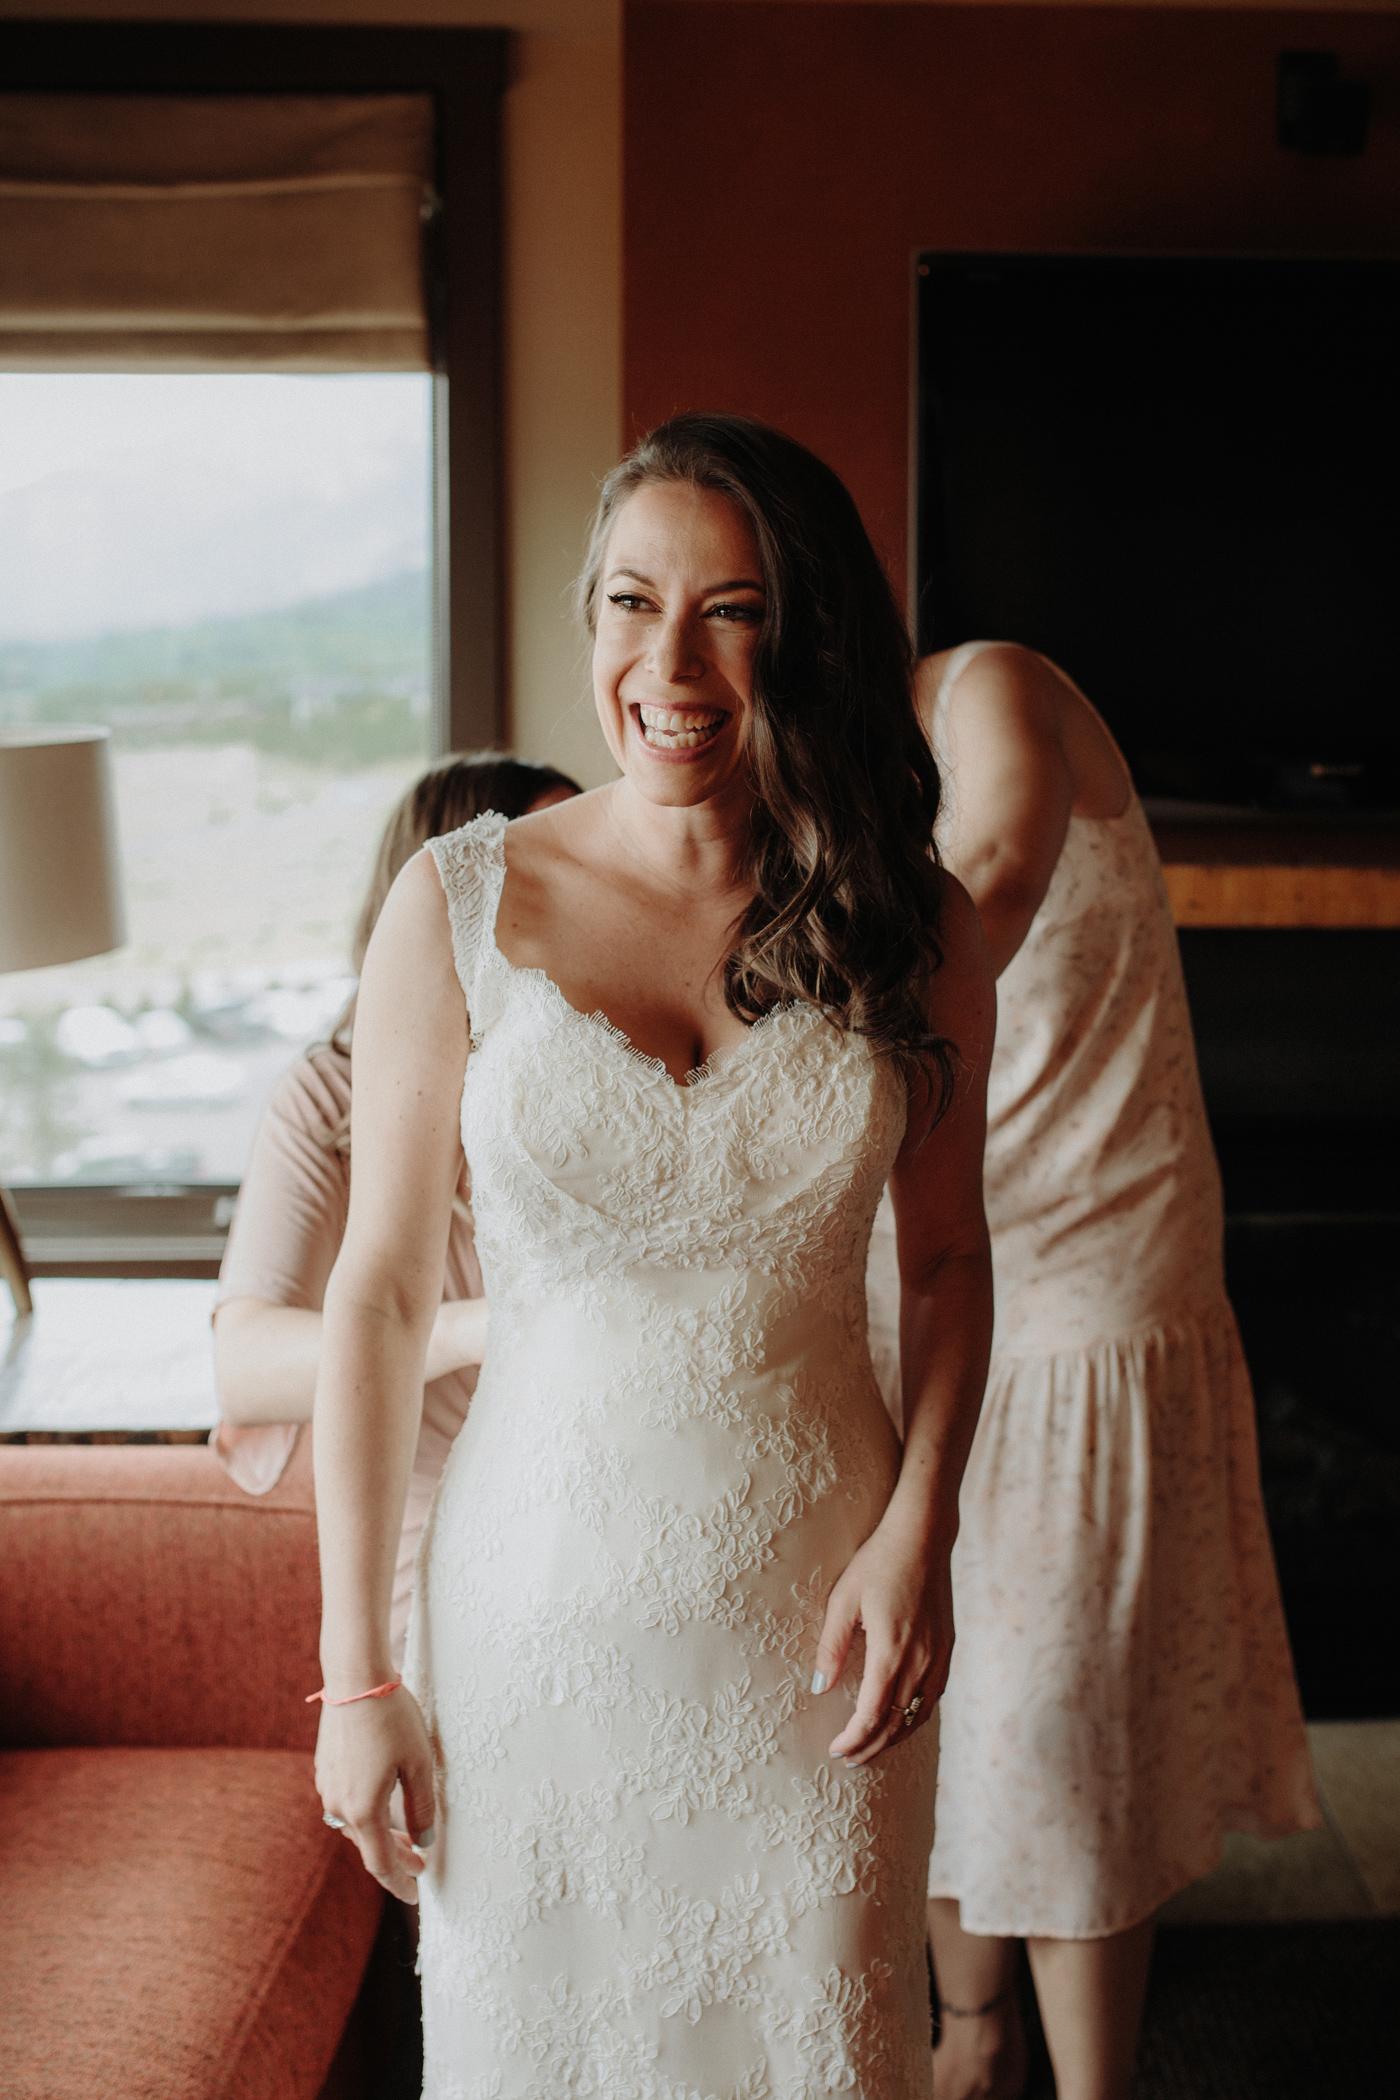 007-grand-teton-jackson-hole-wyoming-wedding.jpg